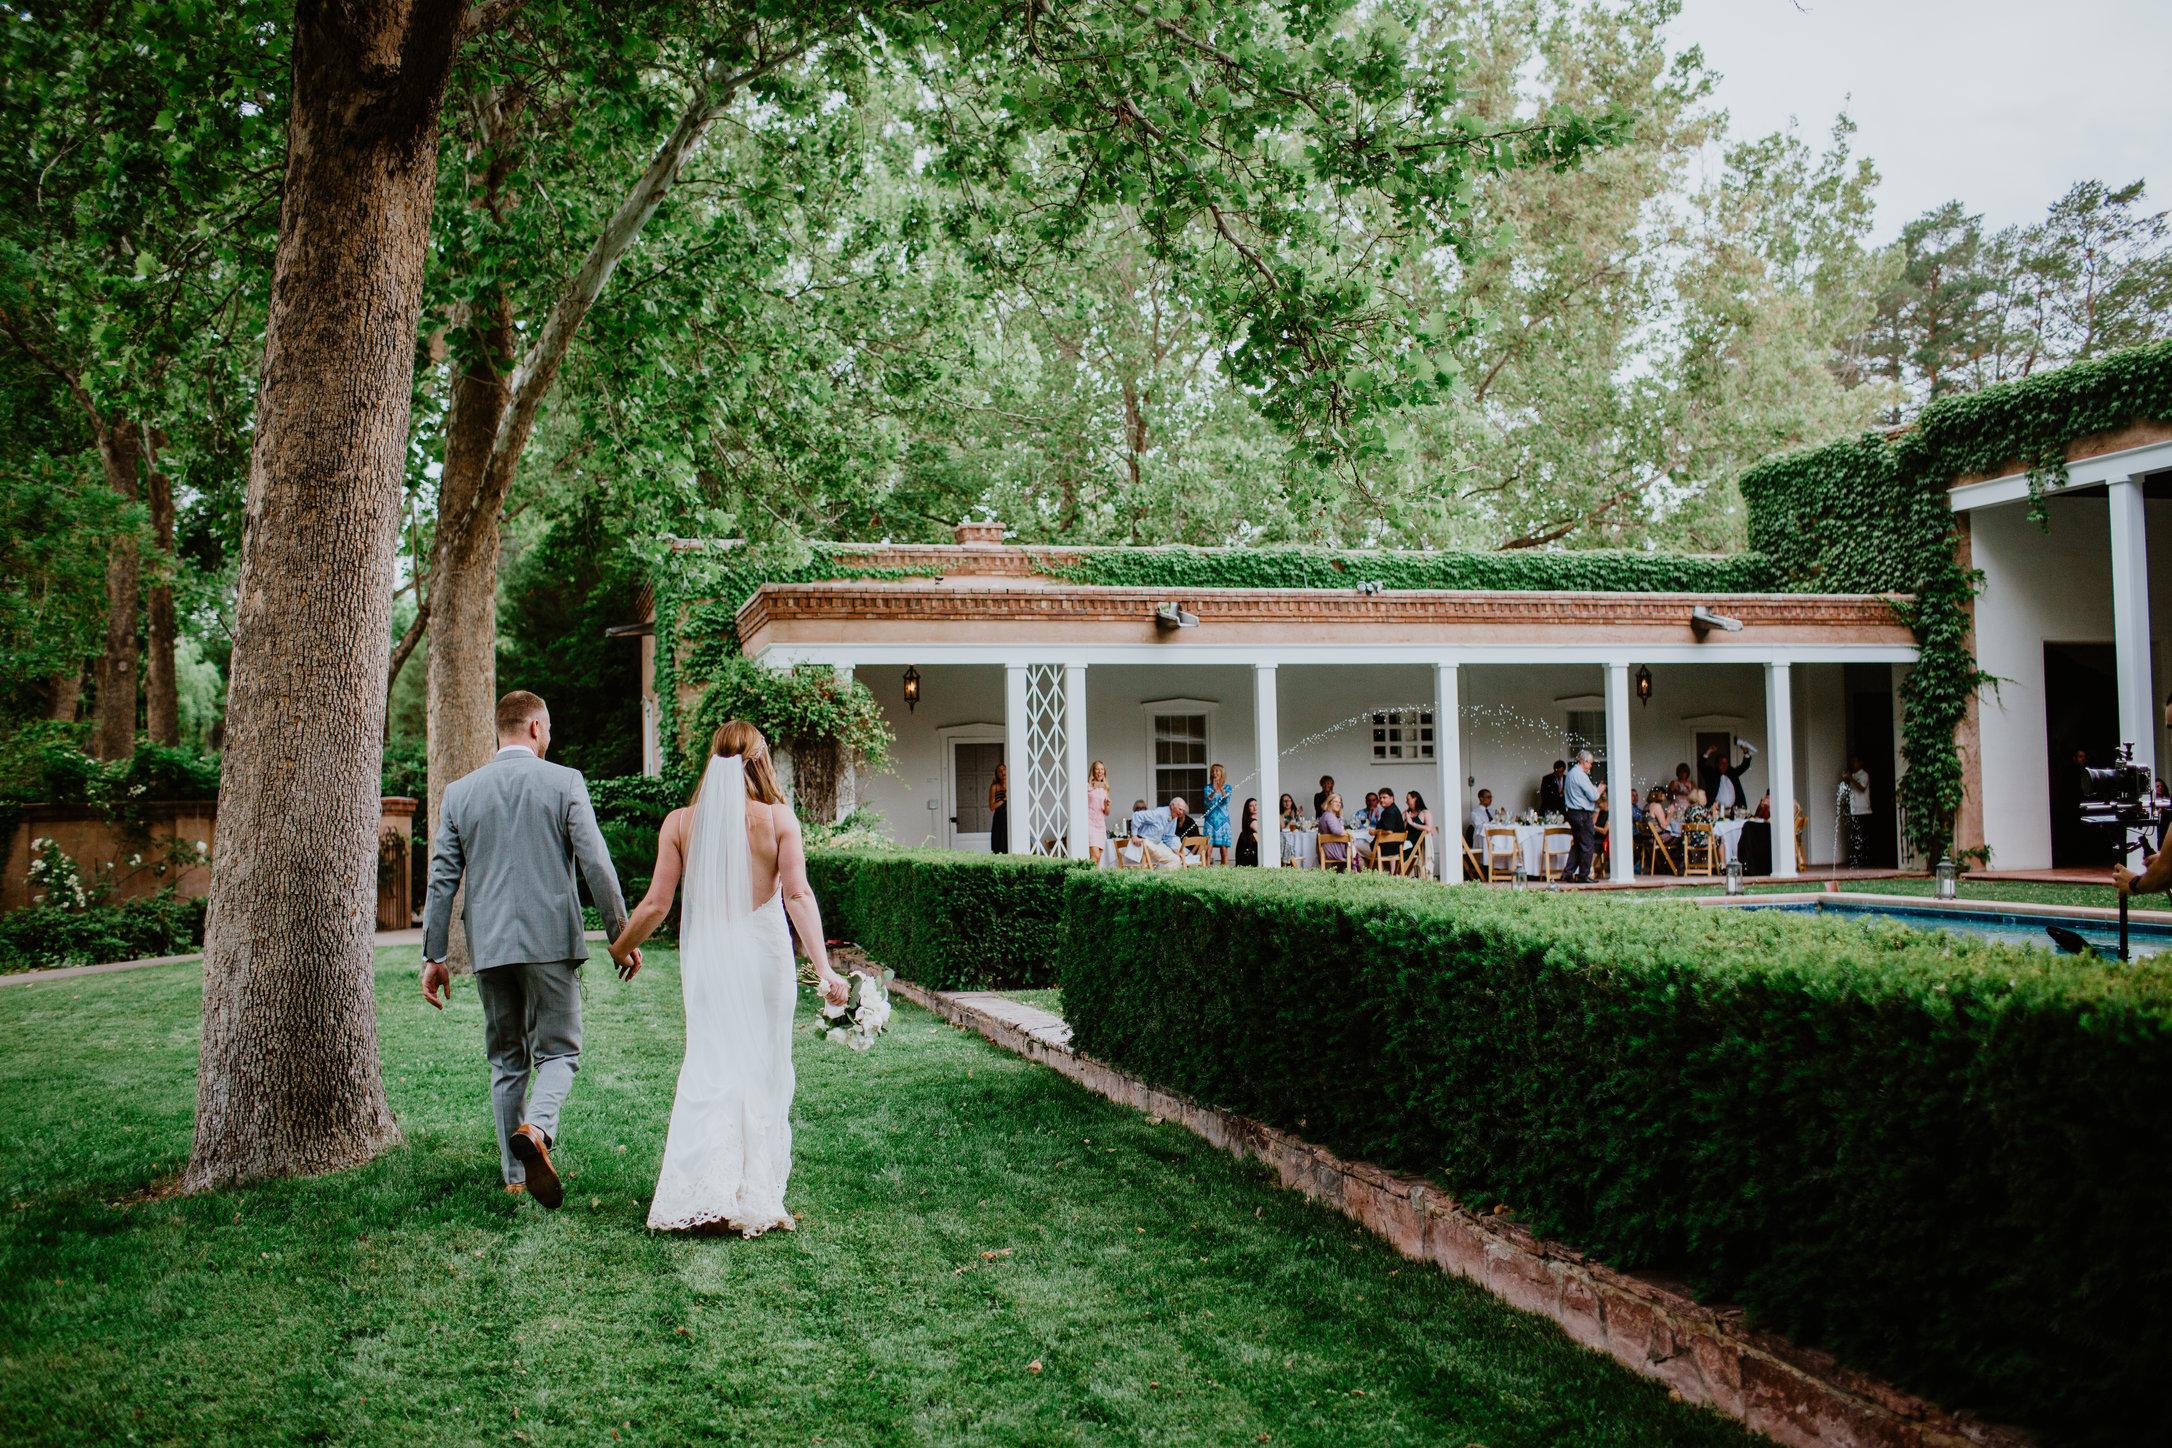 DandA-wedding-565.jpg